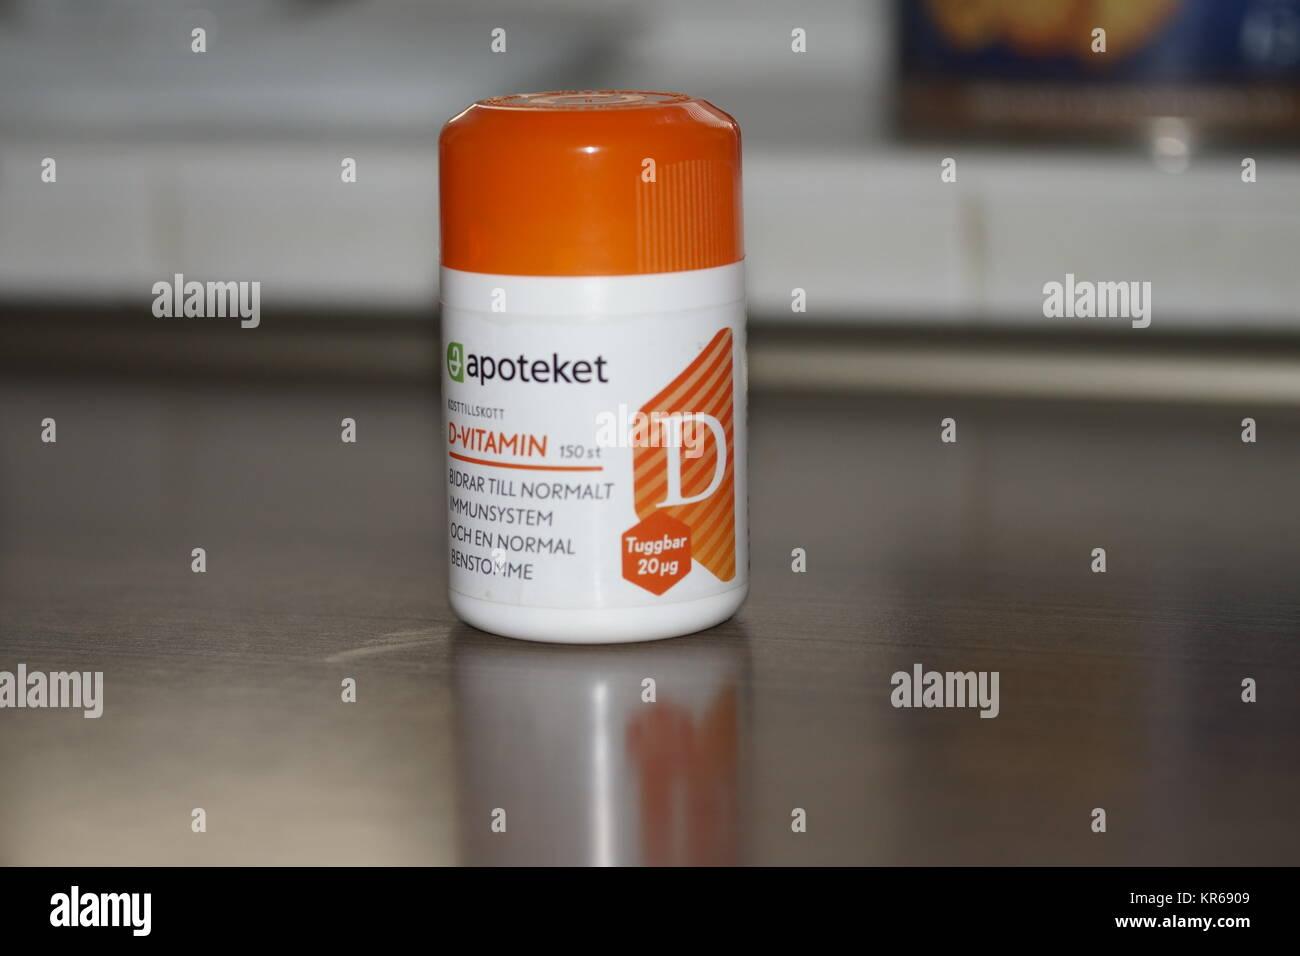 Vitamine D pack of medicines - Stock Image